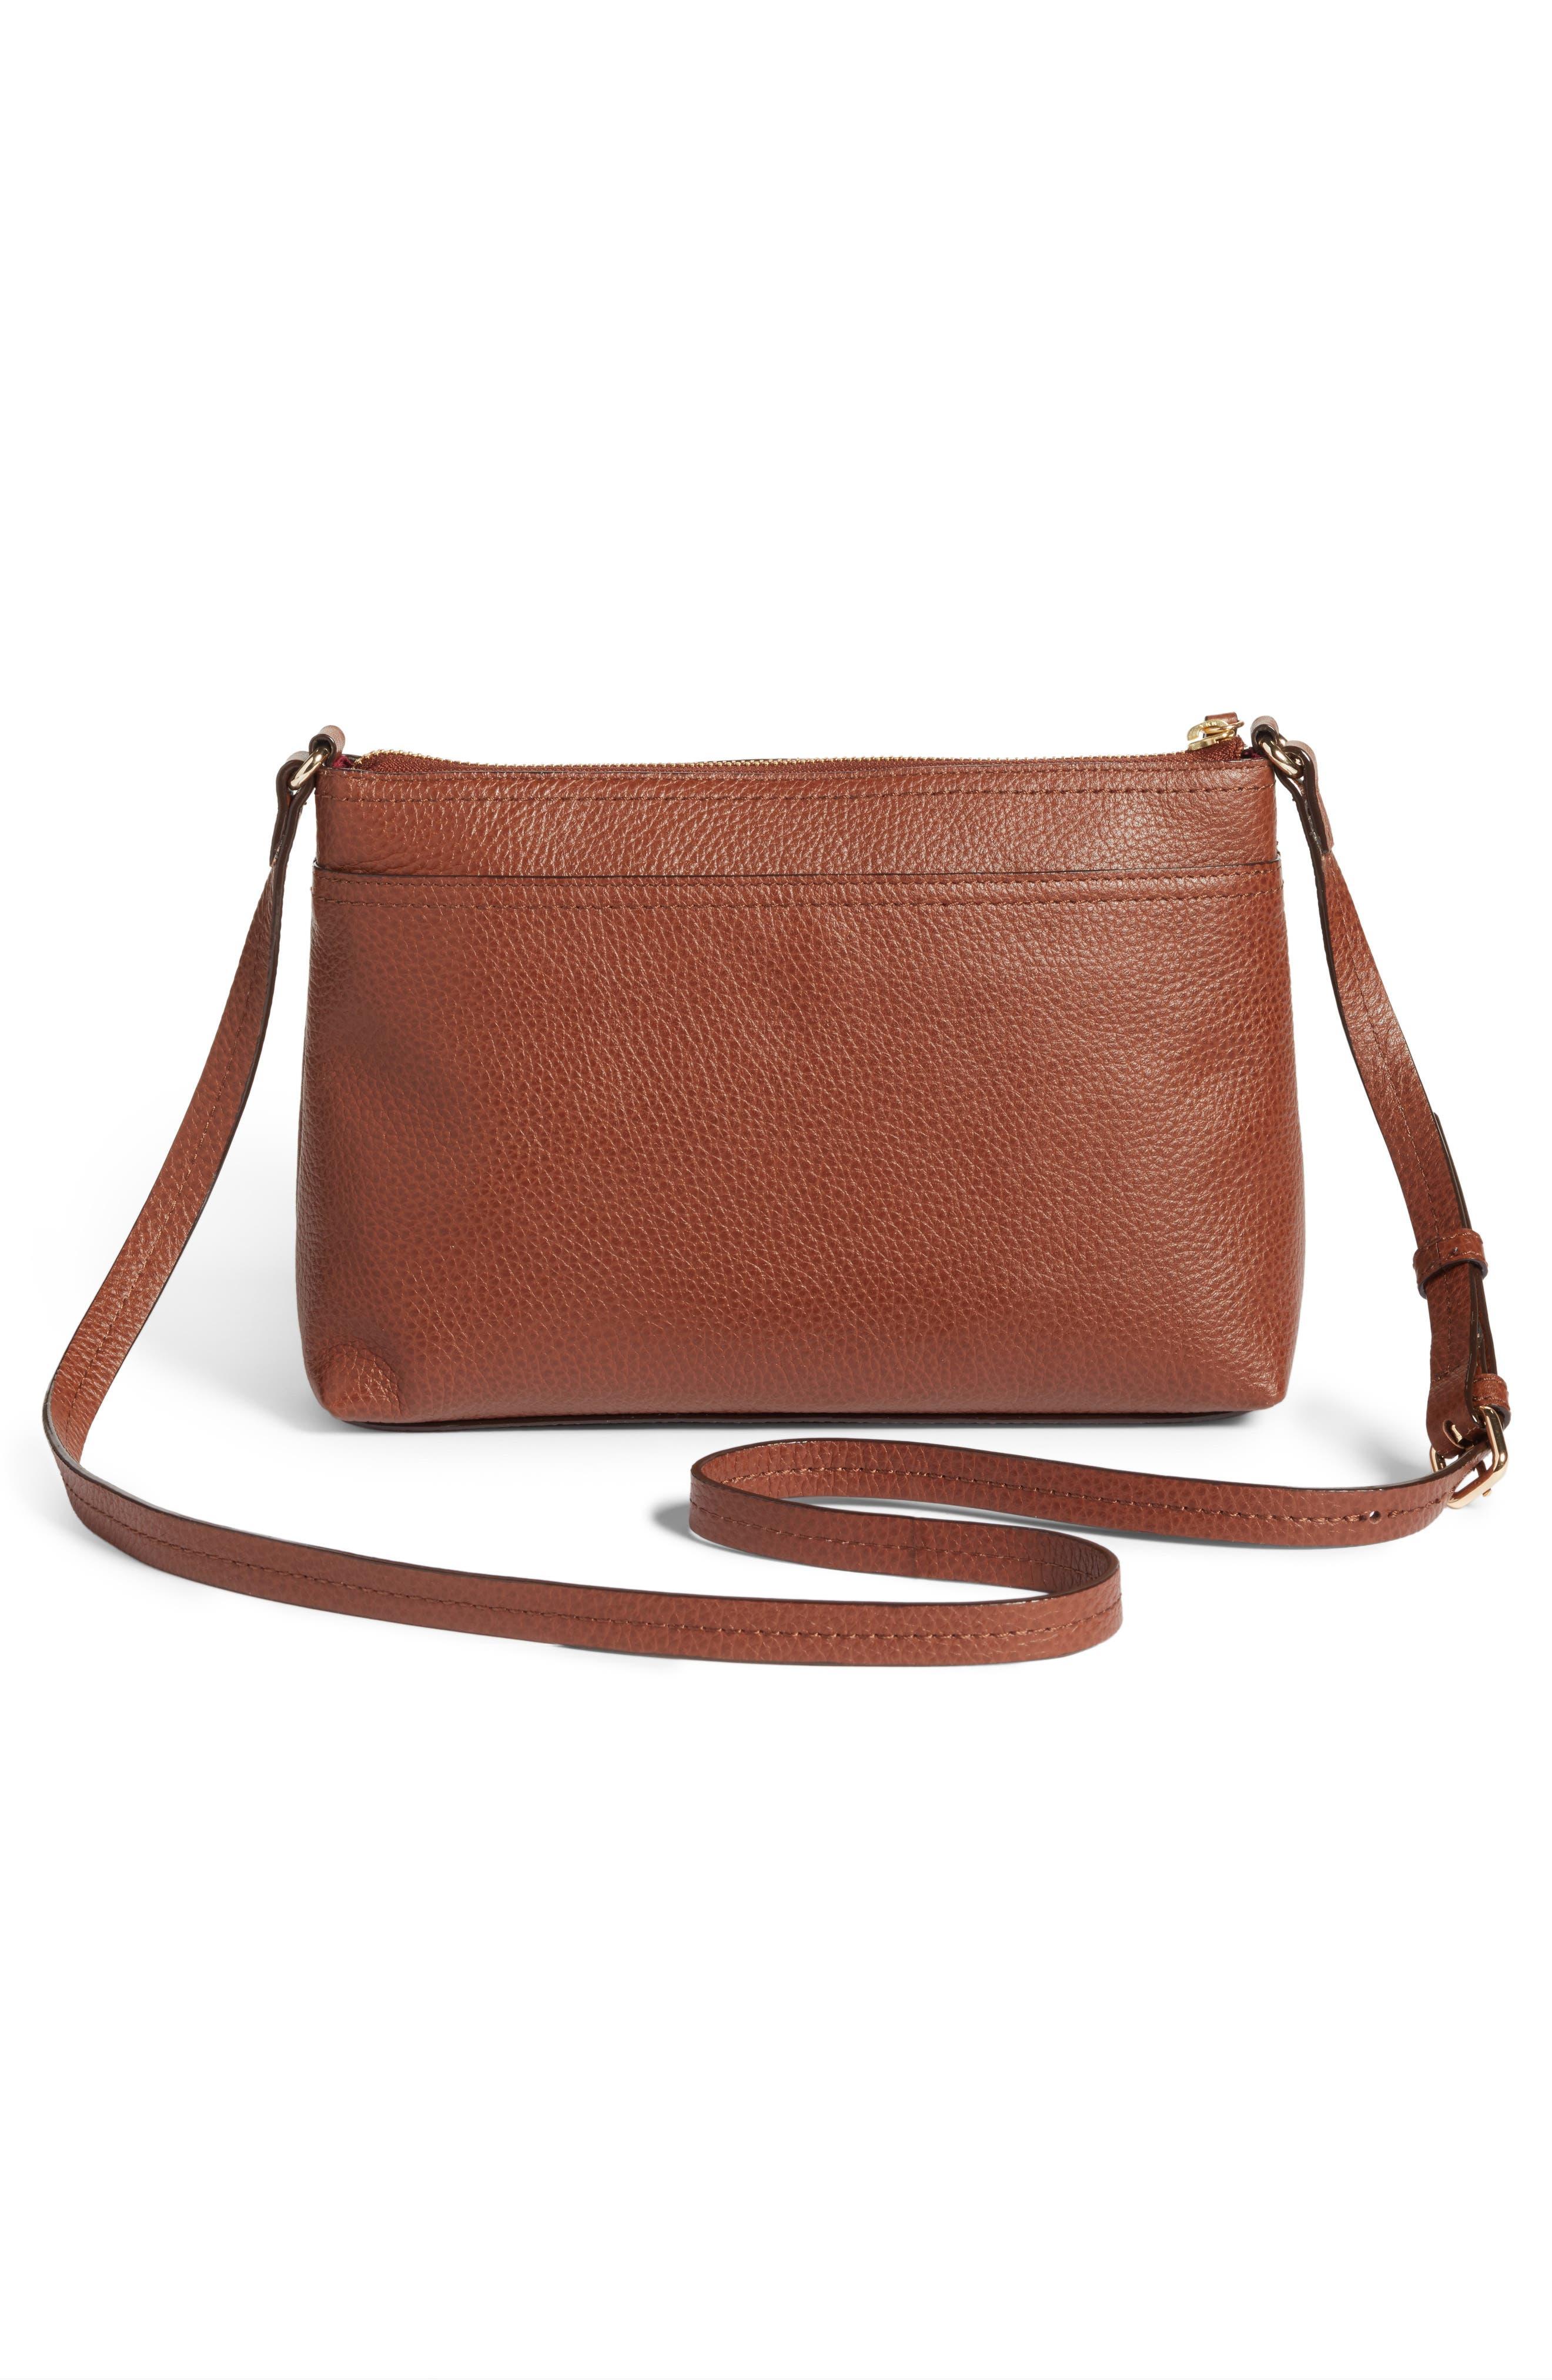 Pebbled Leather Crossbody Bag,                             Alternate thumbnail 11, color,